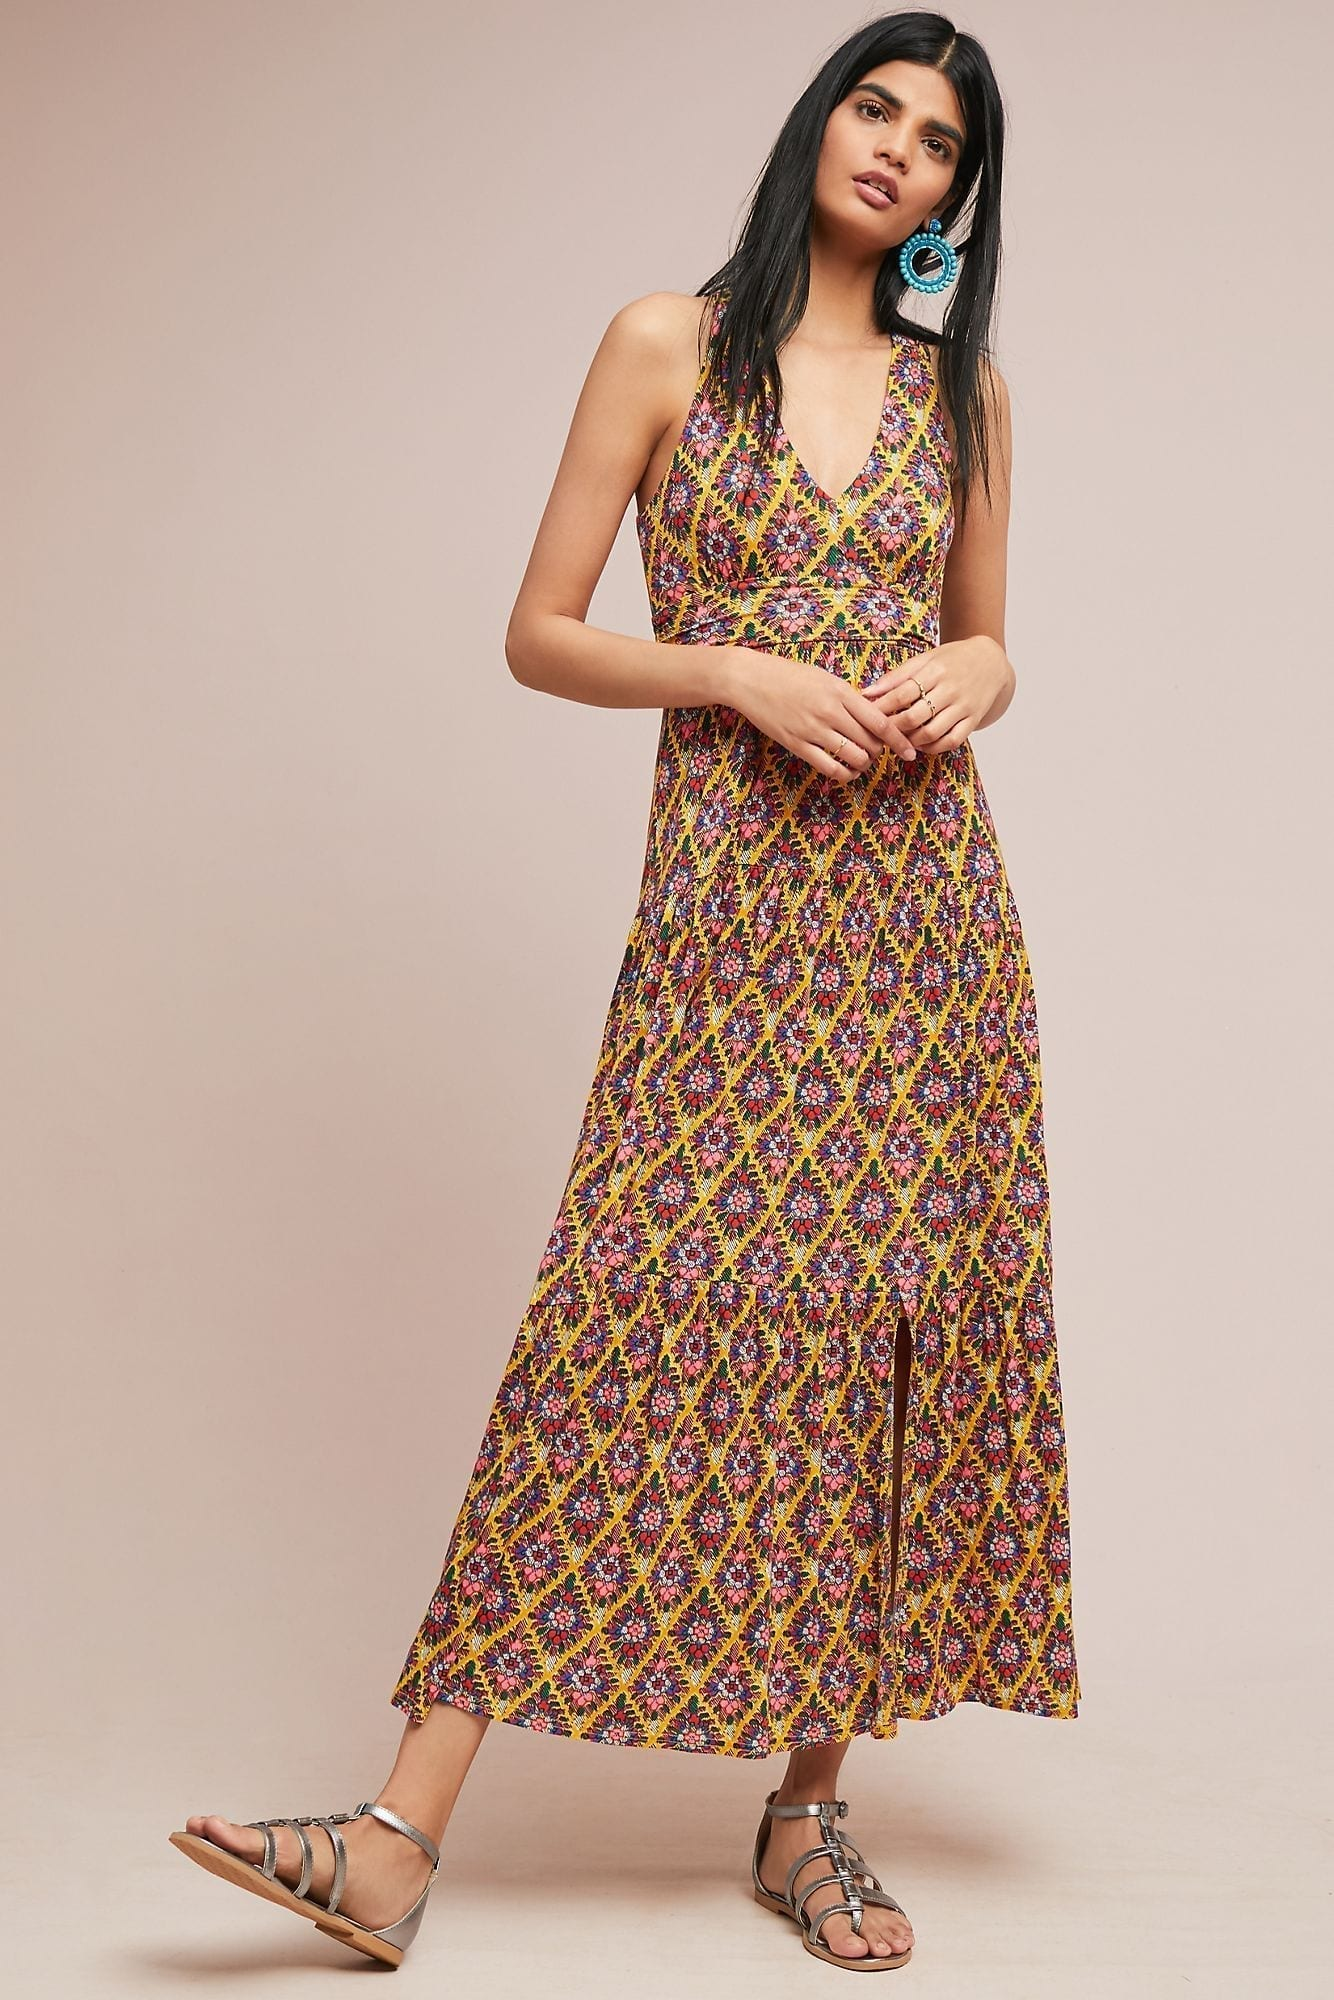 MAEVE Luella Maxi Yellow Dress